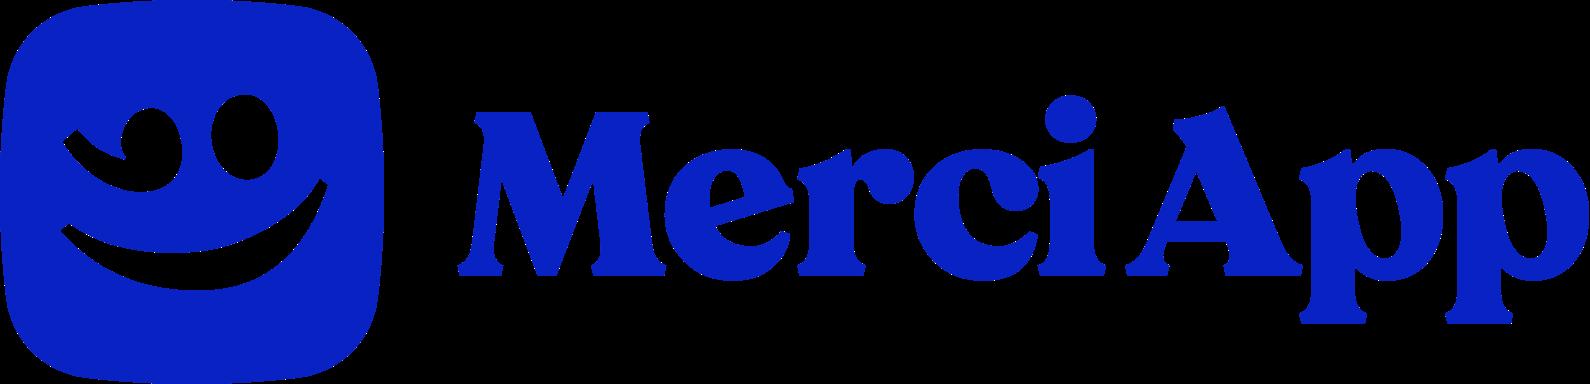 logo MerciApp